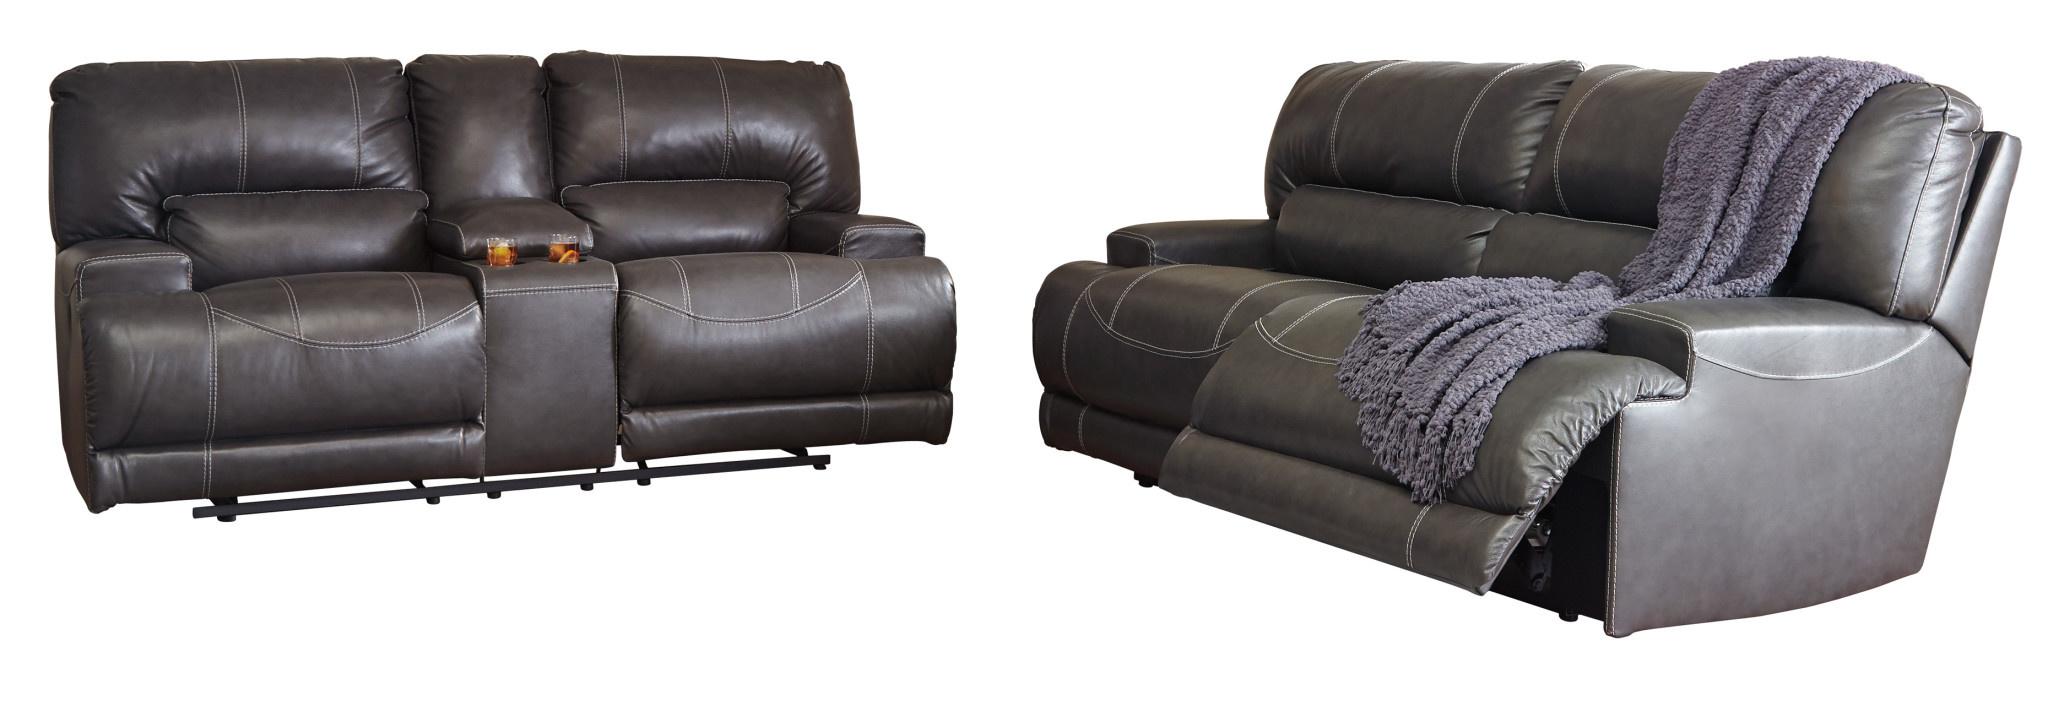 "Signature Design ""McCaskill"" Leather DBL Reclining Loveseat w/ Console- Gray- U6090094"